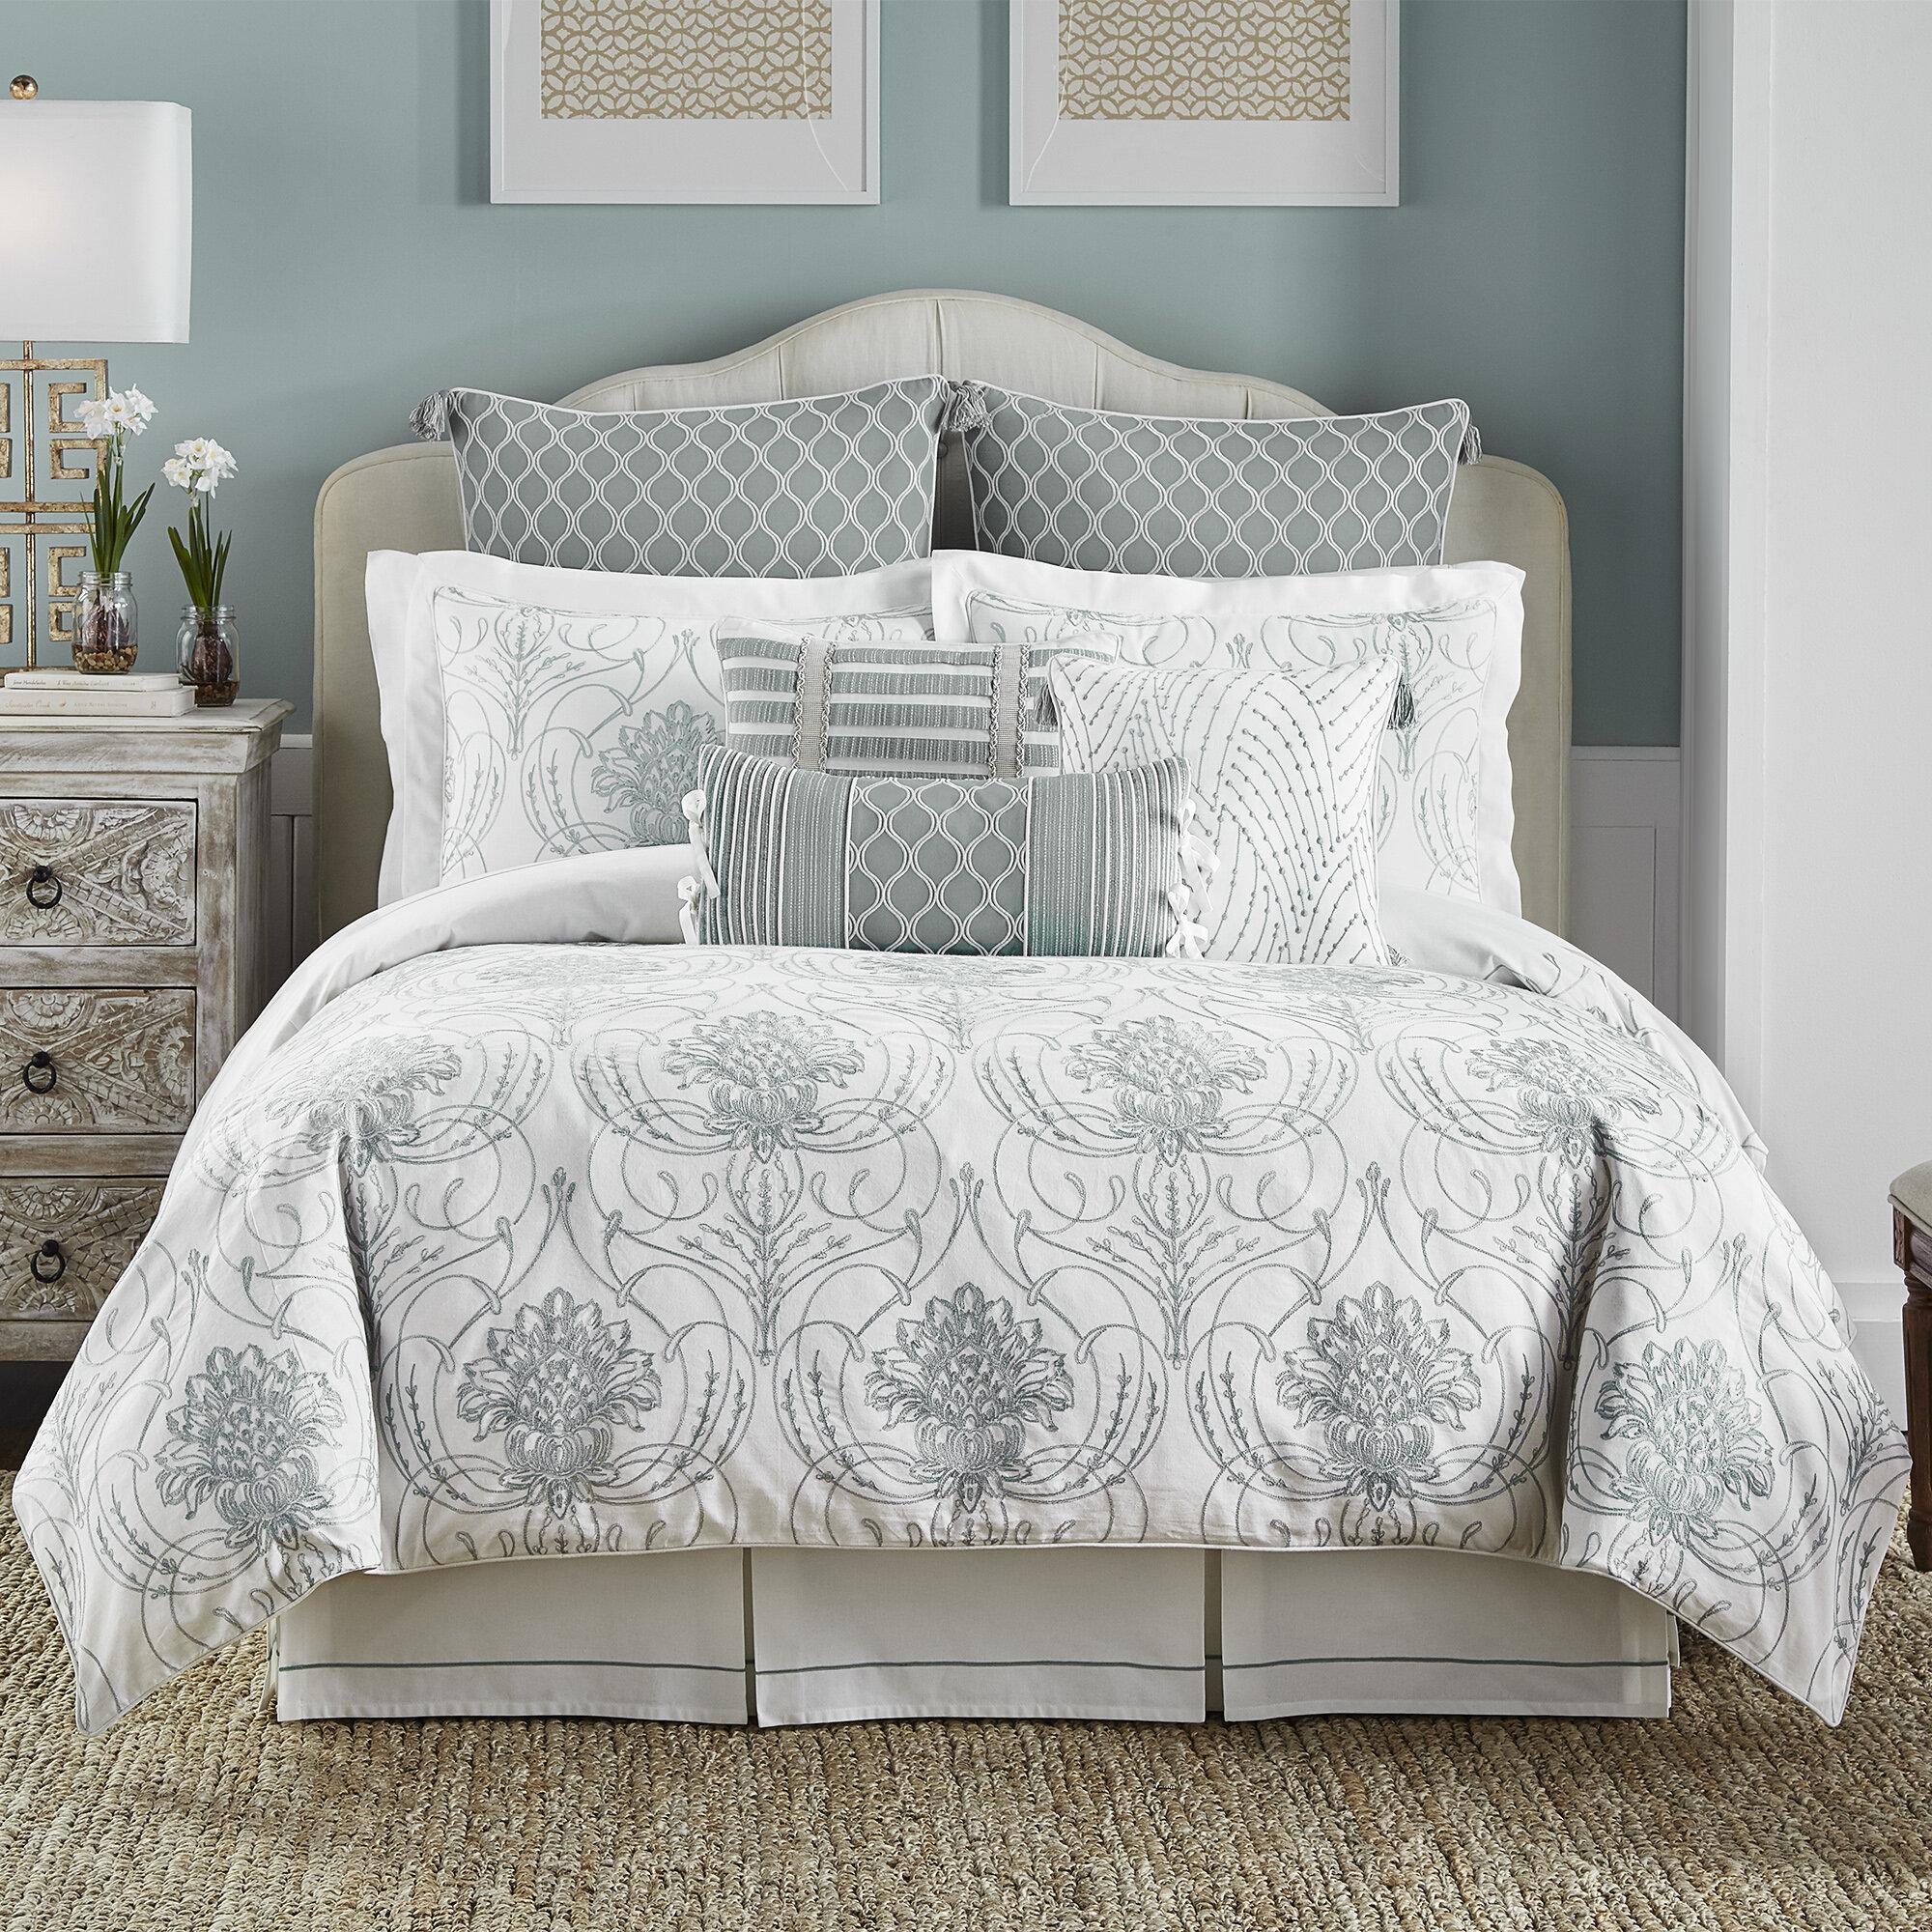 Croscill Eleyana 4 Piece Reversible Comforter Set & Reviews | Wayfair